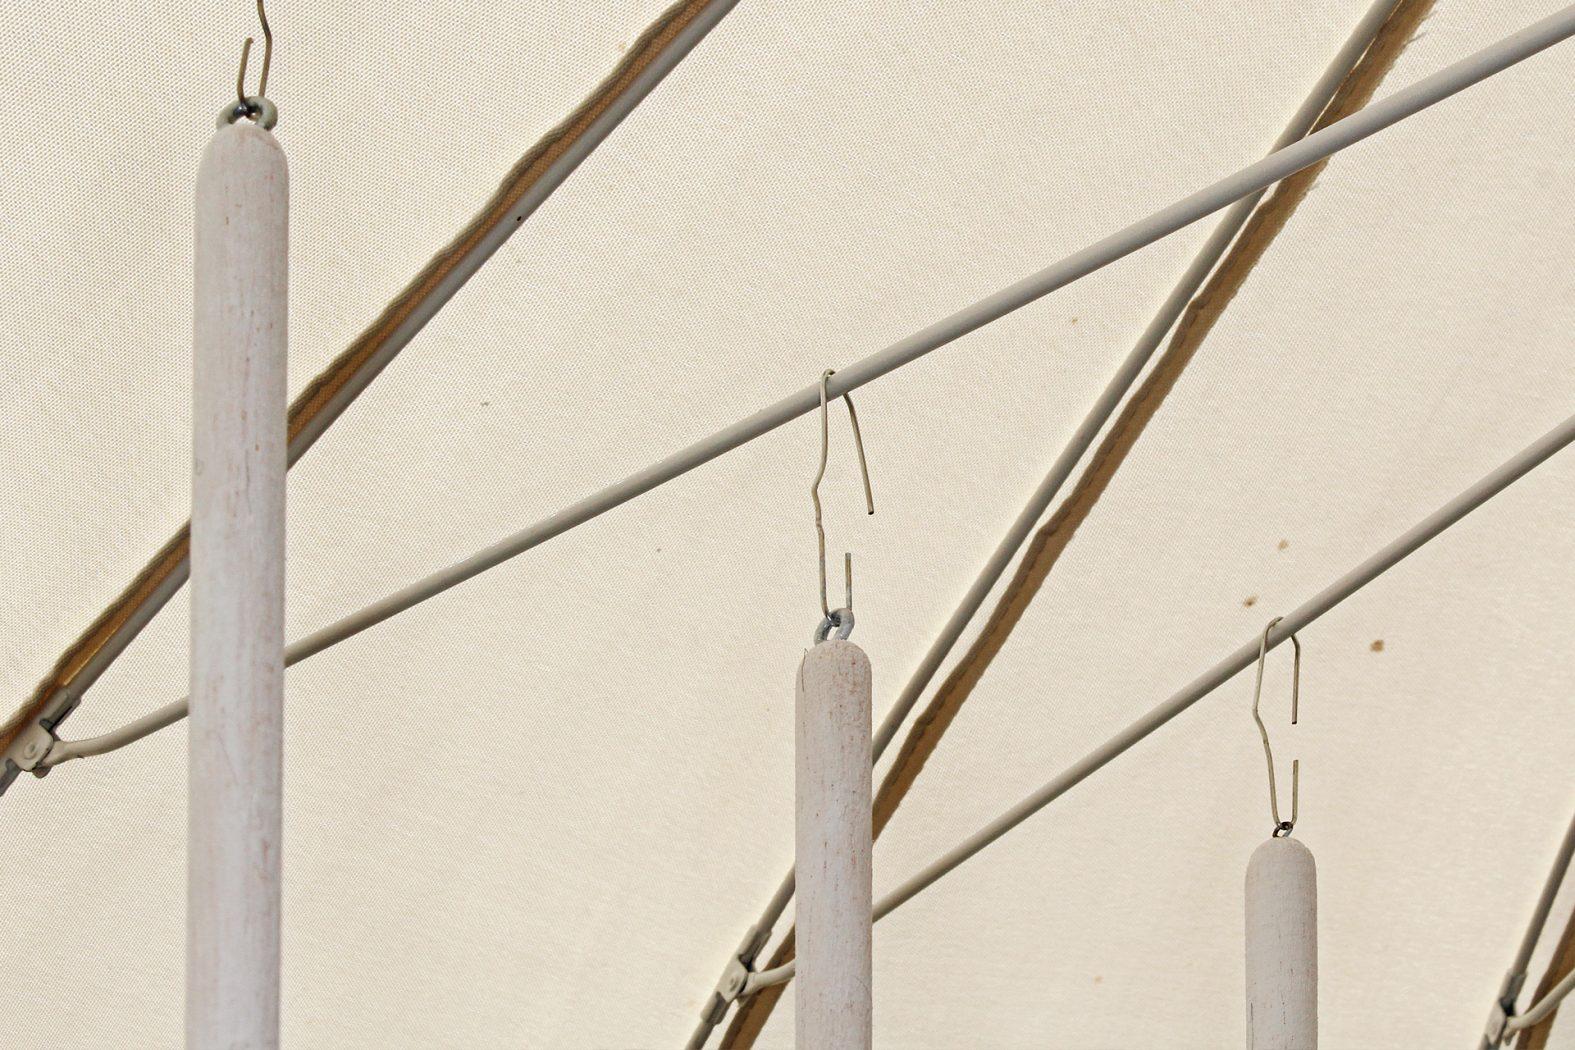 Balsaholz-Posen selber bauen